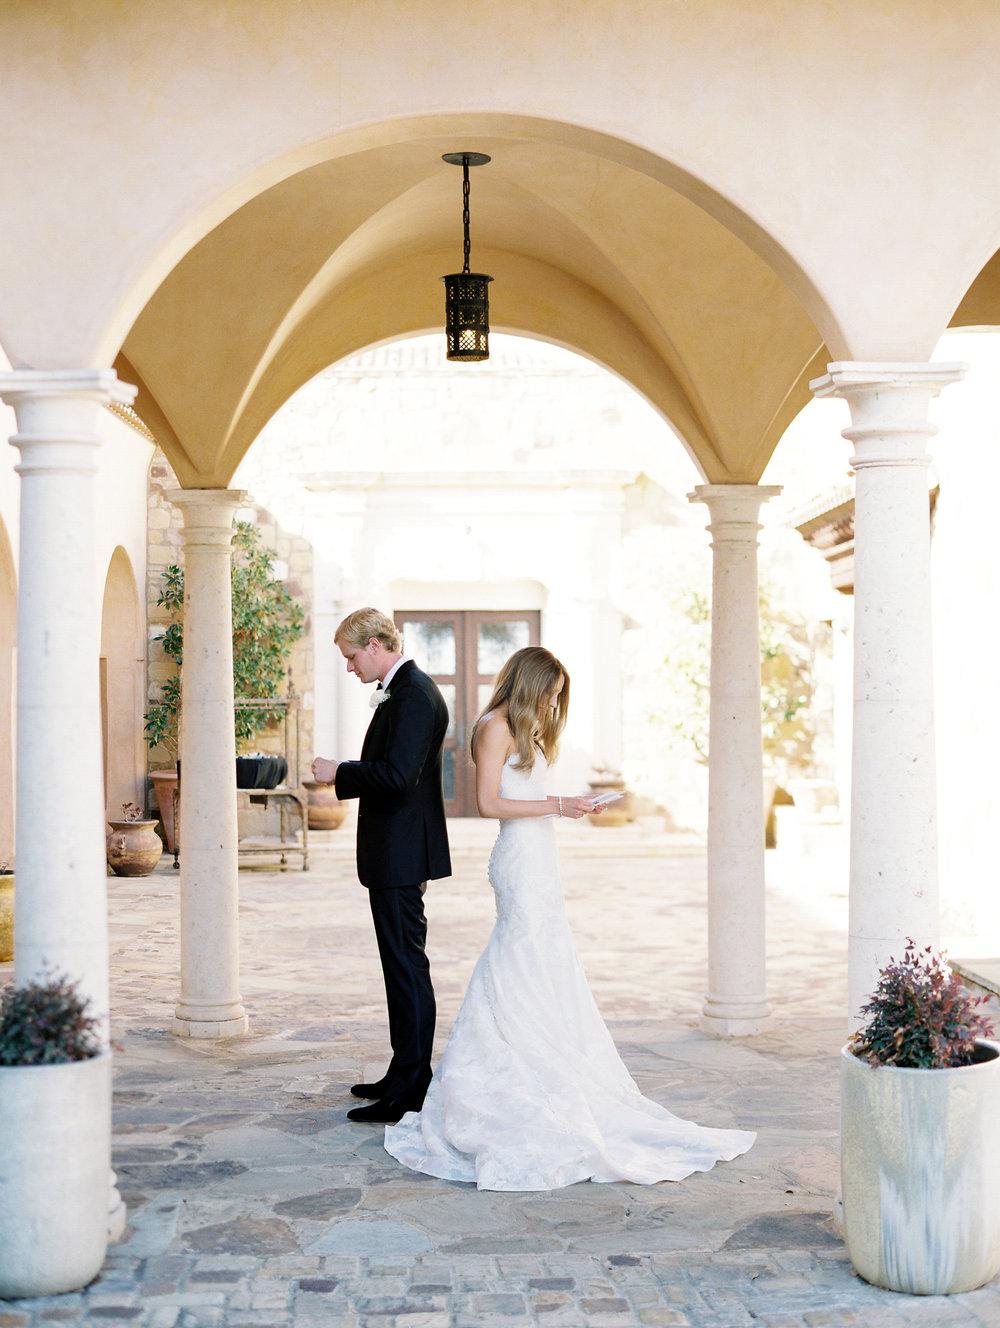 Escondido-Golf_Lake-Club-Hill-Country-Houston-Wedding-Photographer-Best-Top-Luxury-Destination-Engagements-Portrait-Austin-Photography-10.jpg